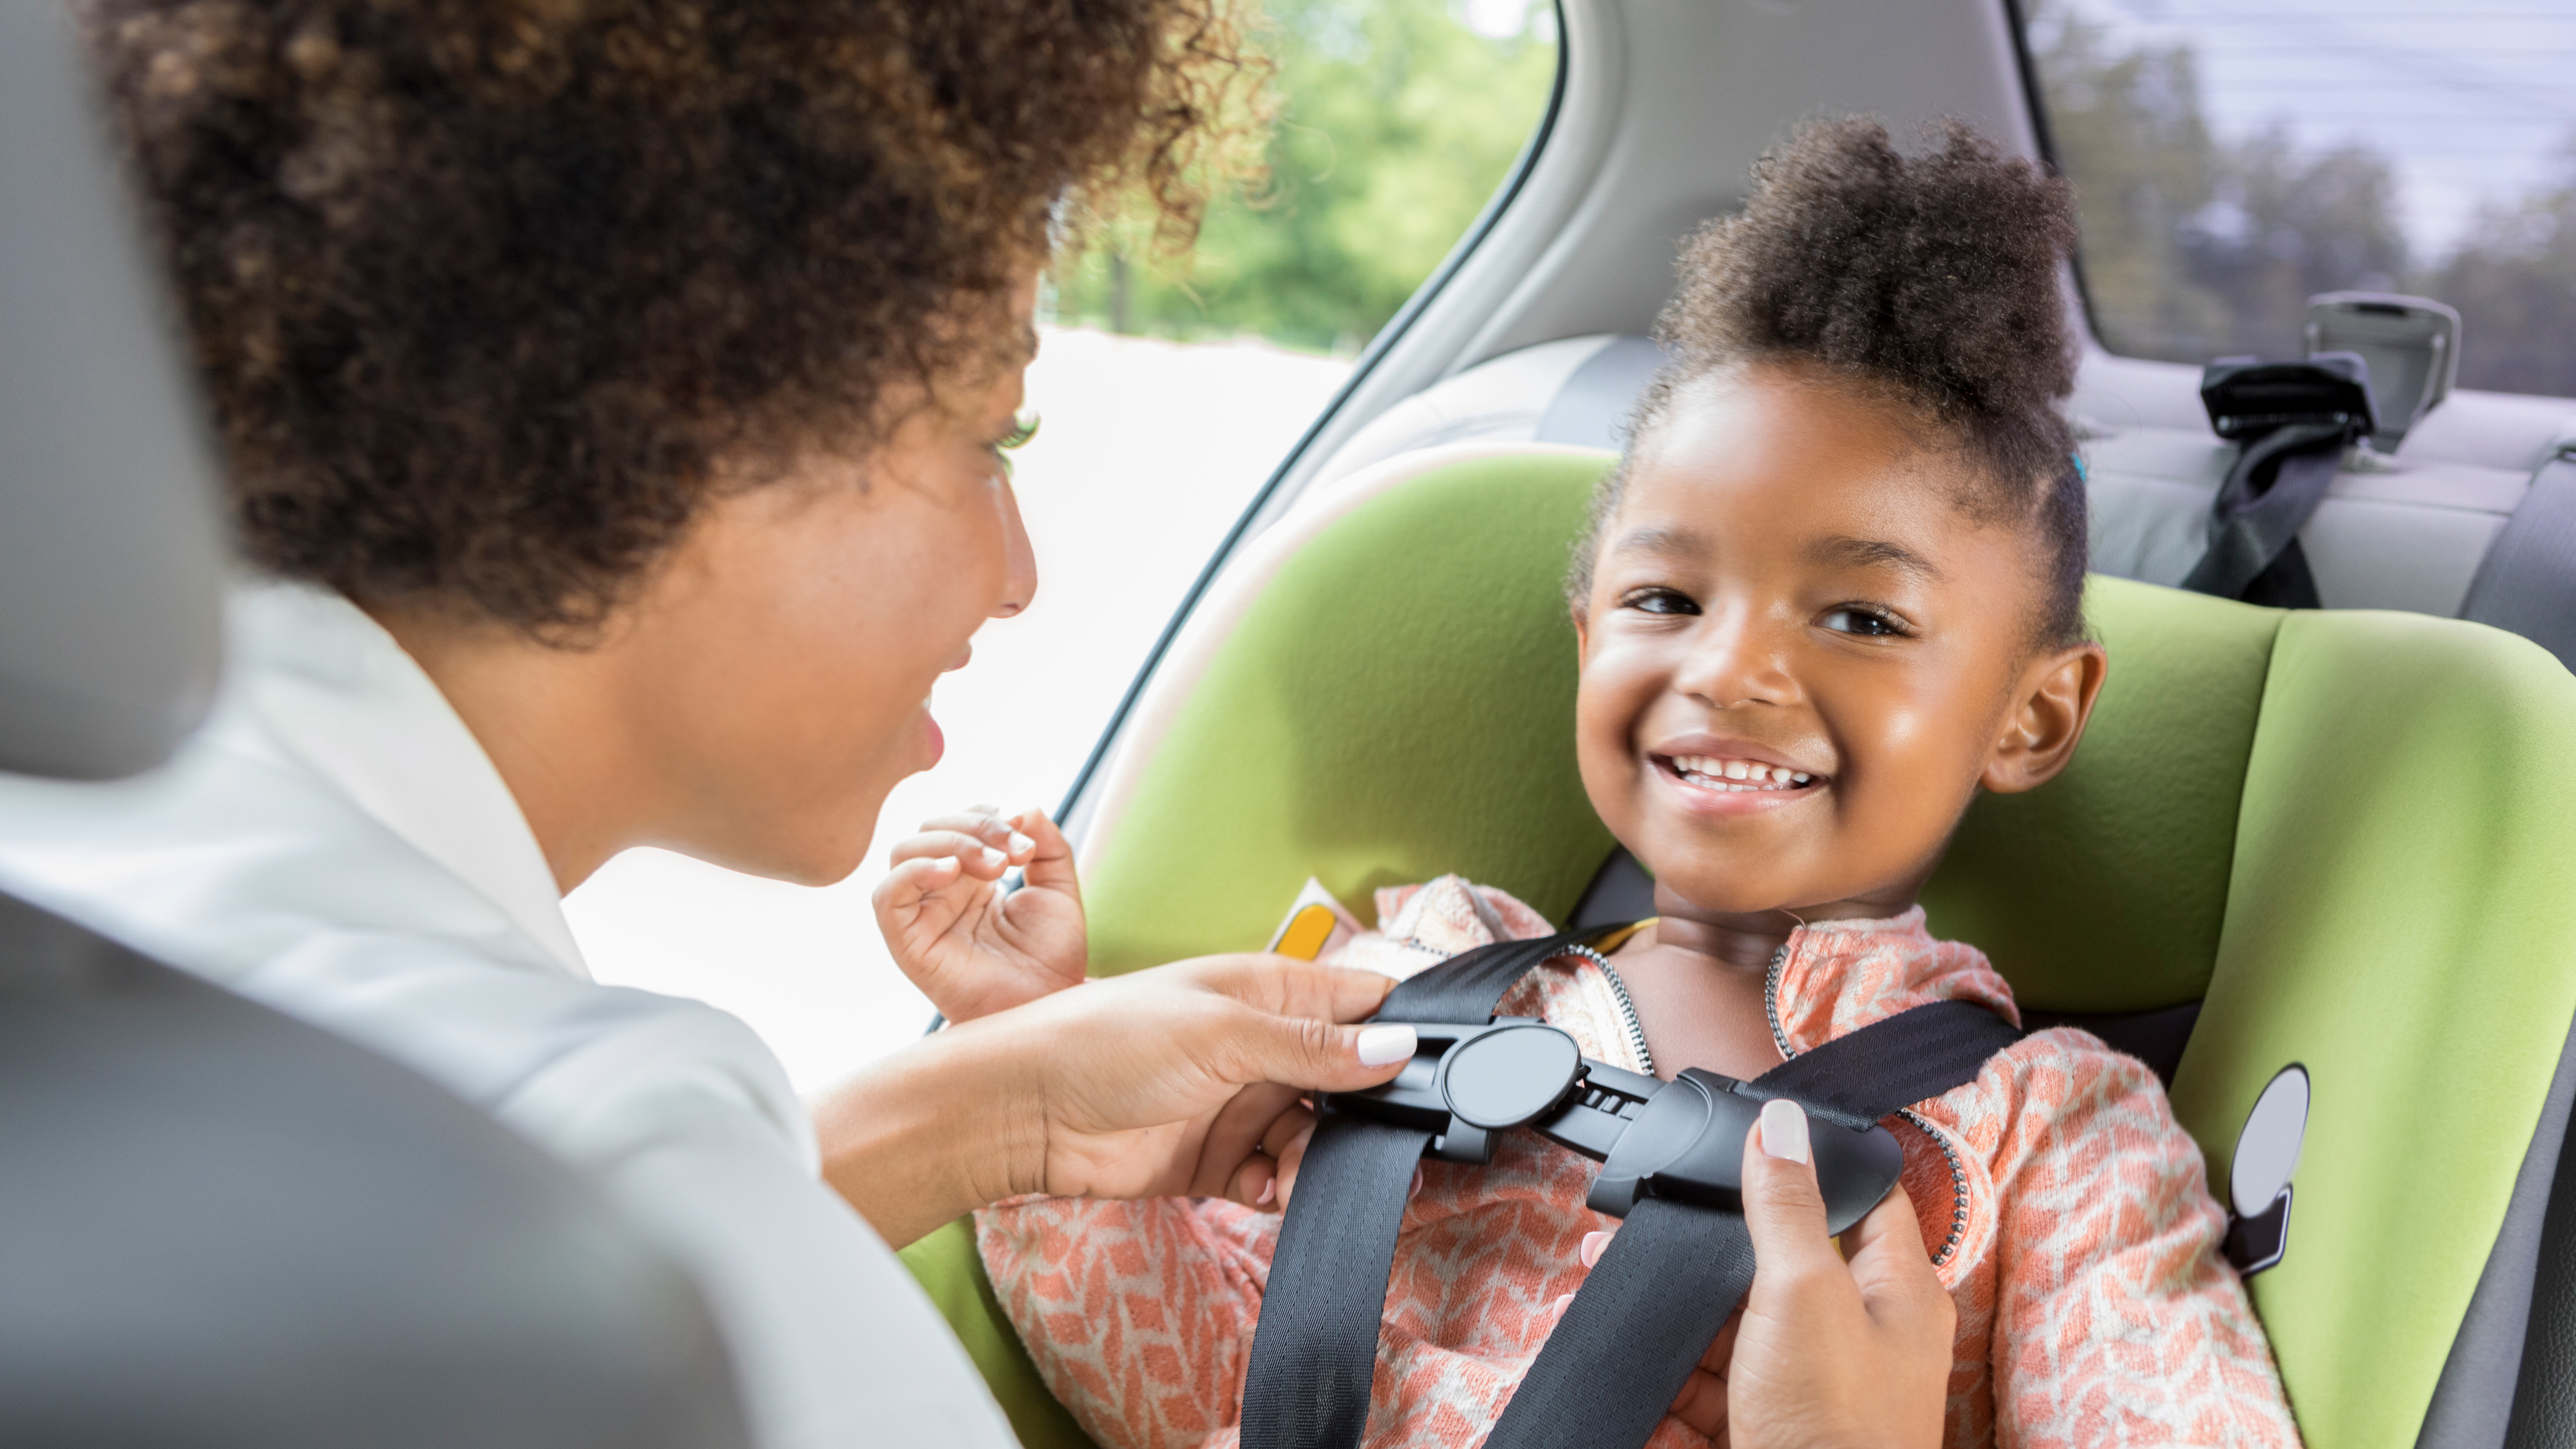 CAR SEAT HEAD HUGGER SUPPORT FIT MAXI COSI PEBBLE NEWBORN BABY HEADREST PILLOW